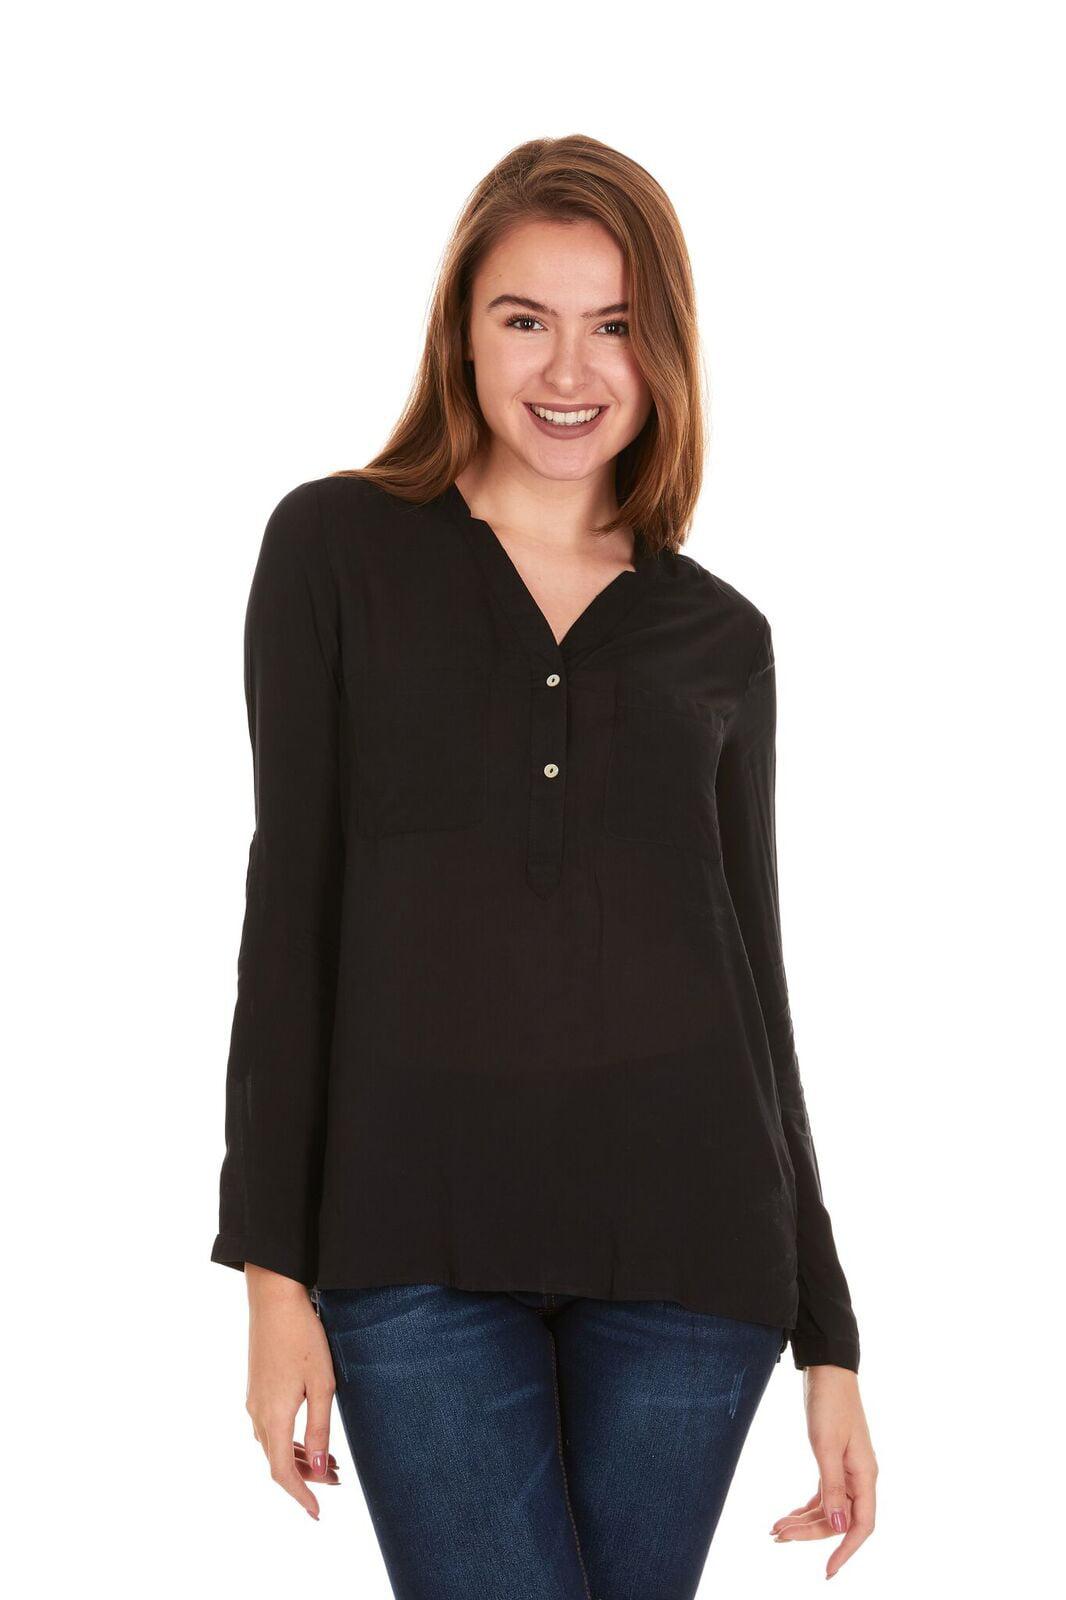 b8f8f75c8478 BRIO LADIES WEAR - Women's V-Neck Button down long sleeve top (White ...